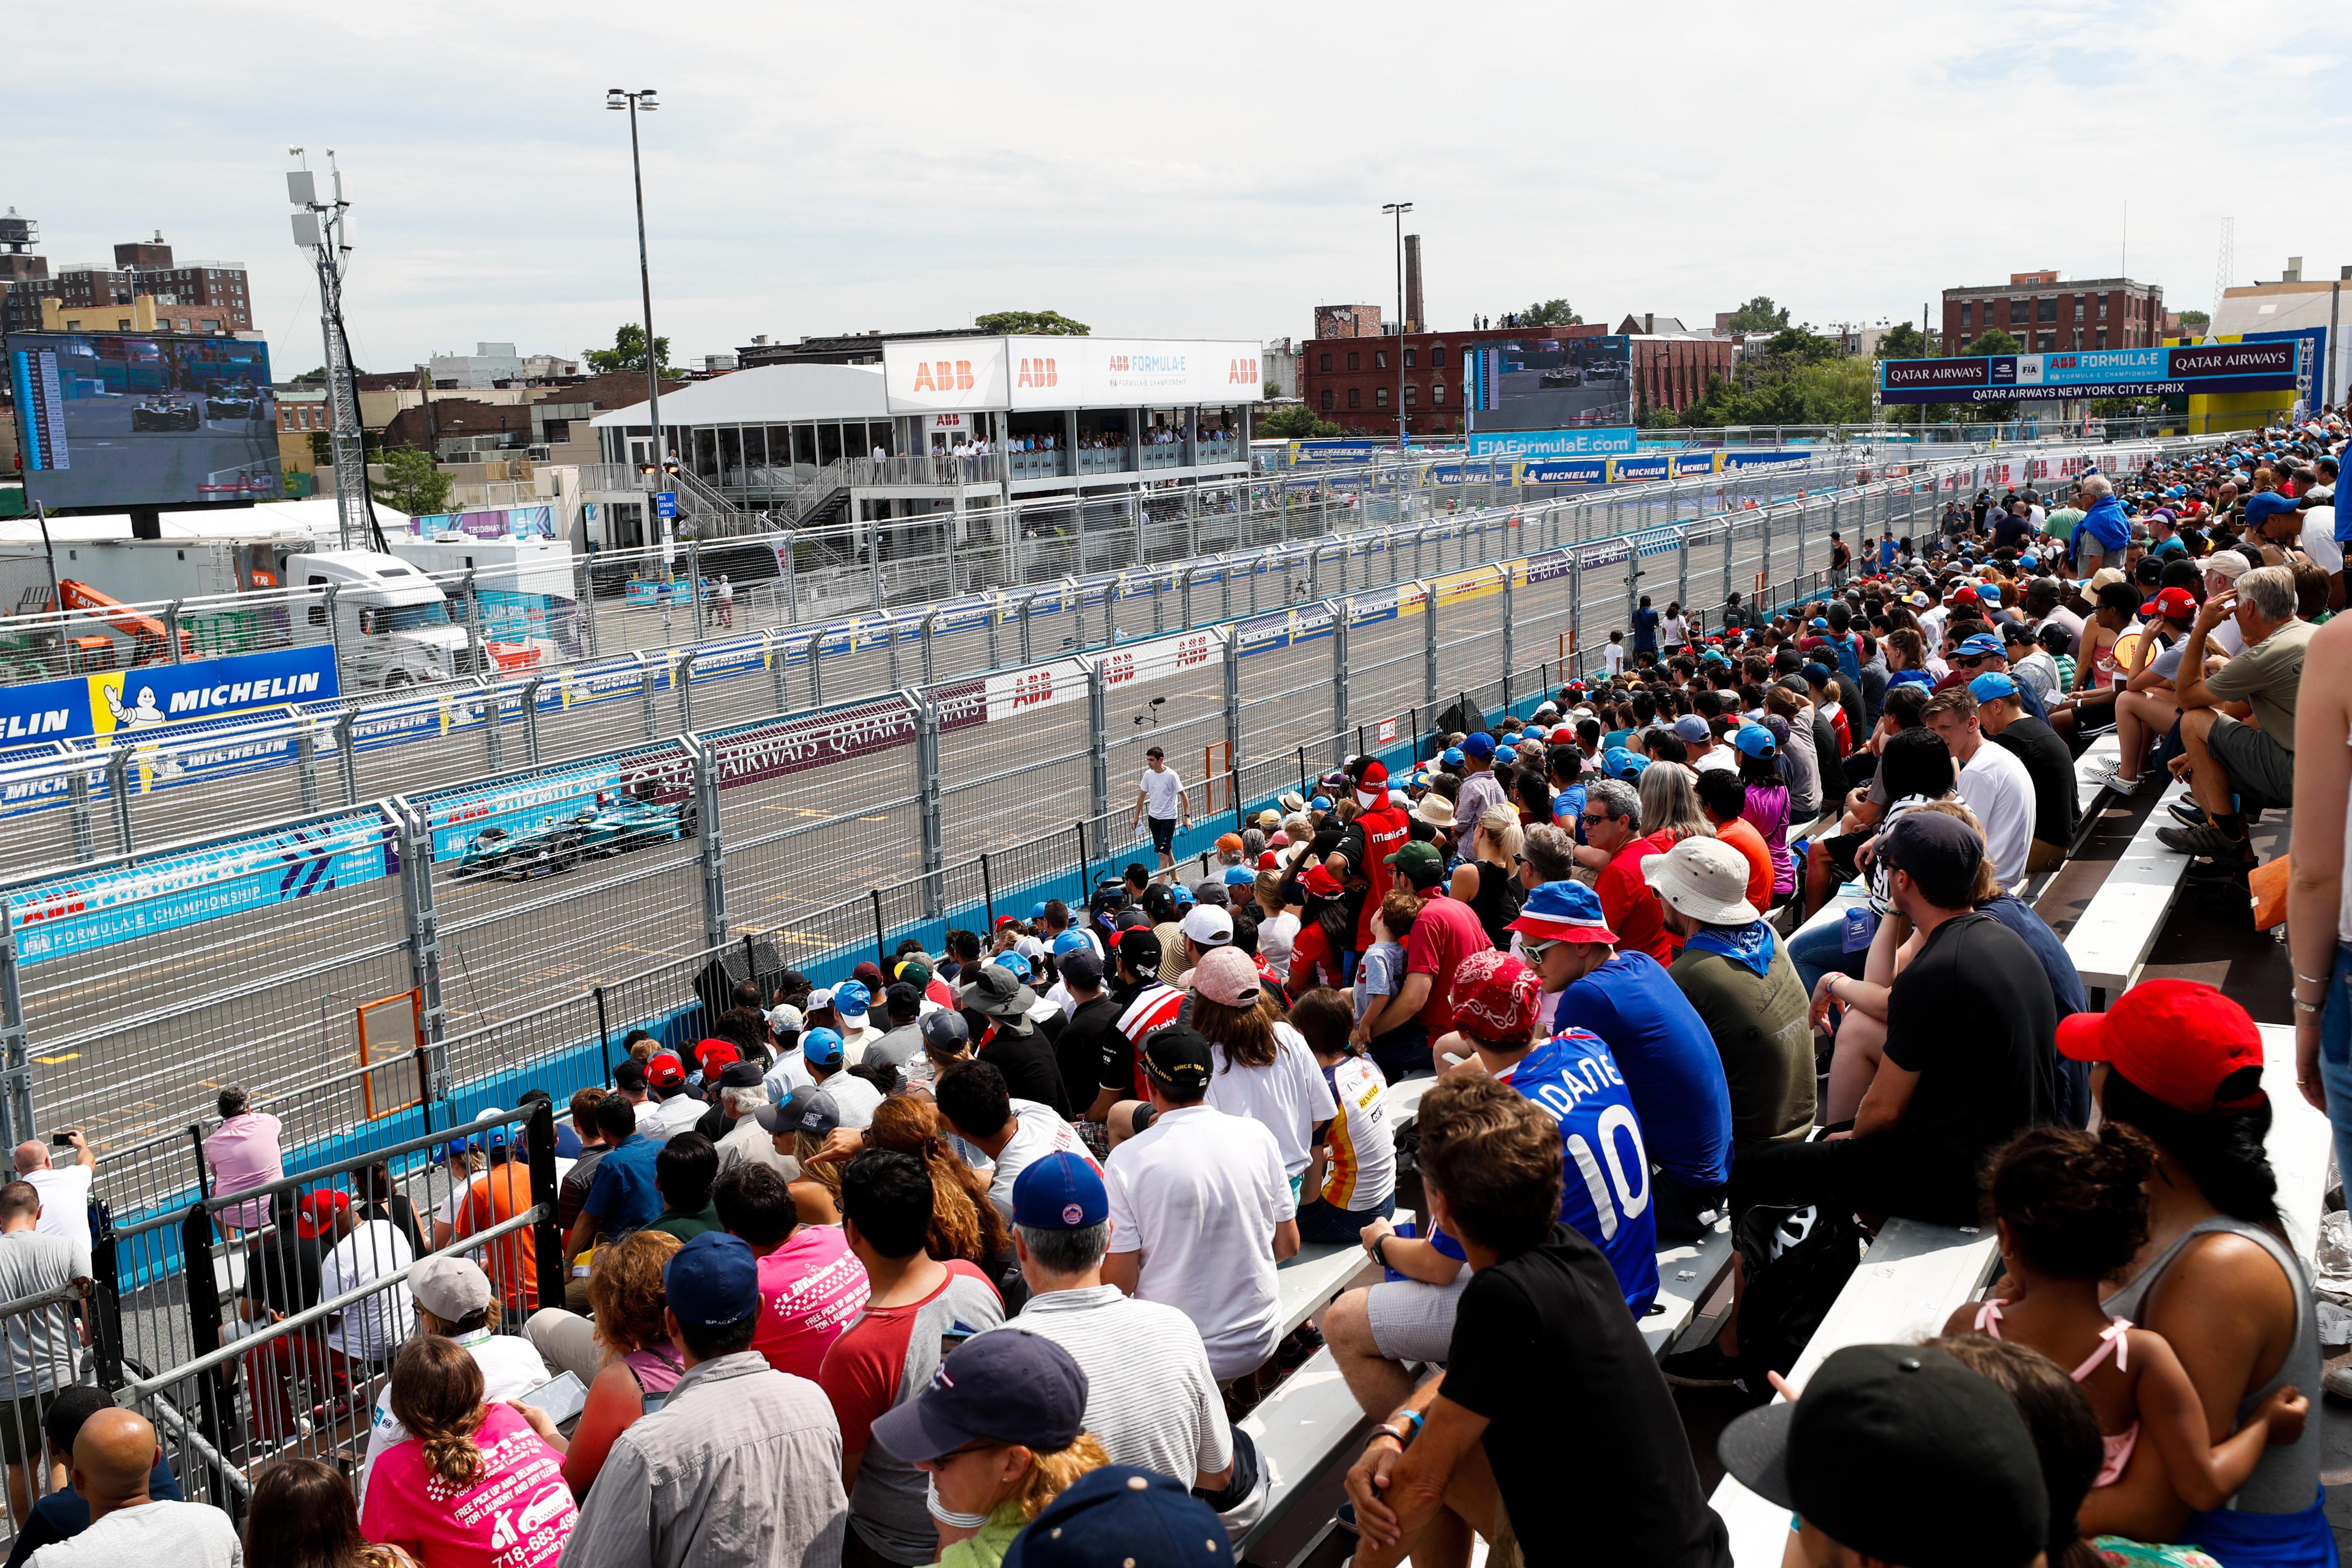 A New York Jean-Eric Vergne si è confermato campione di Formula E.